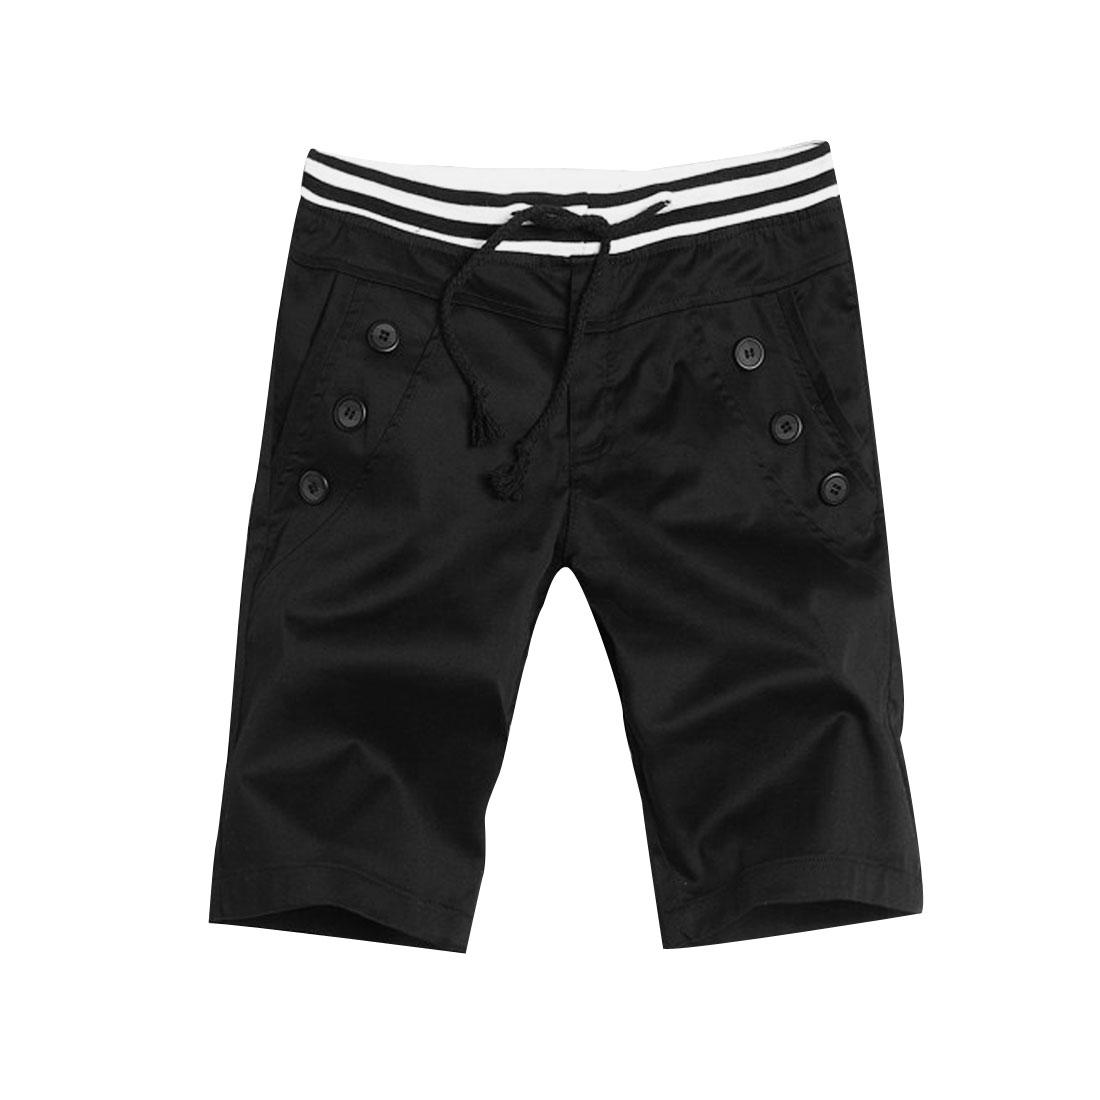 Men Drawstring Waist Buttoned Slant Side Pockets Black Shorts W33